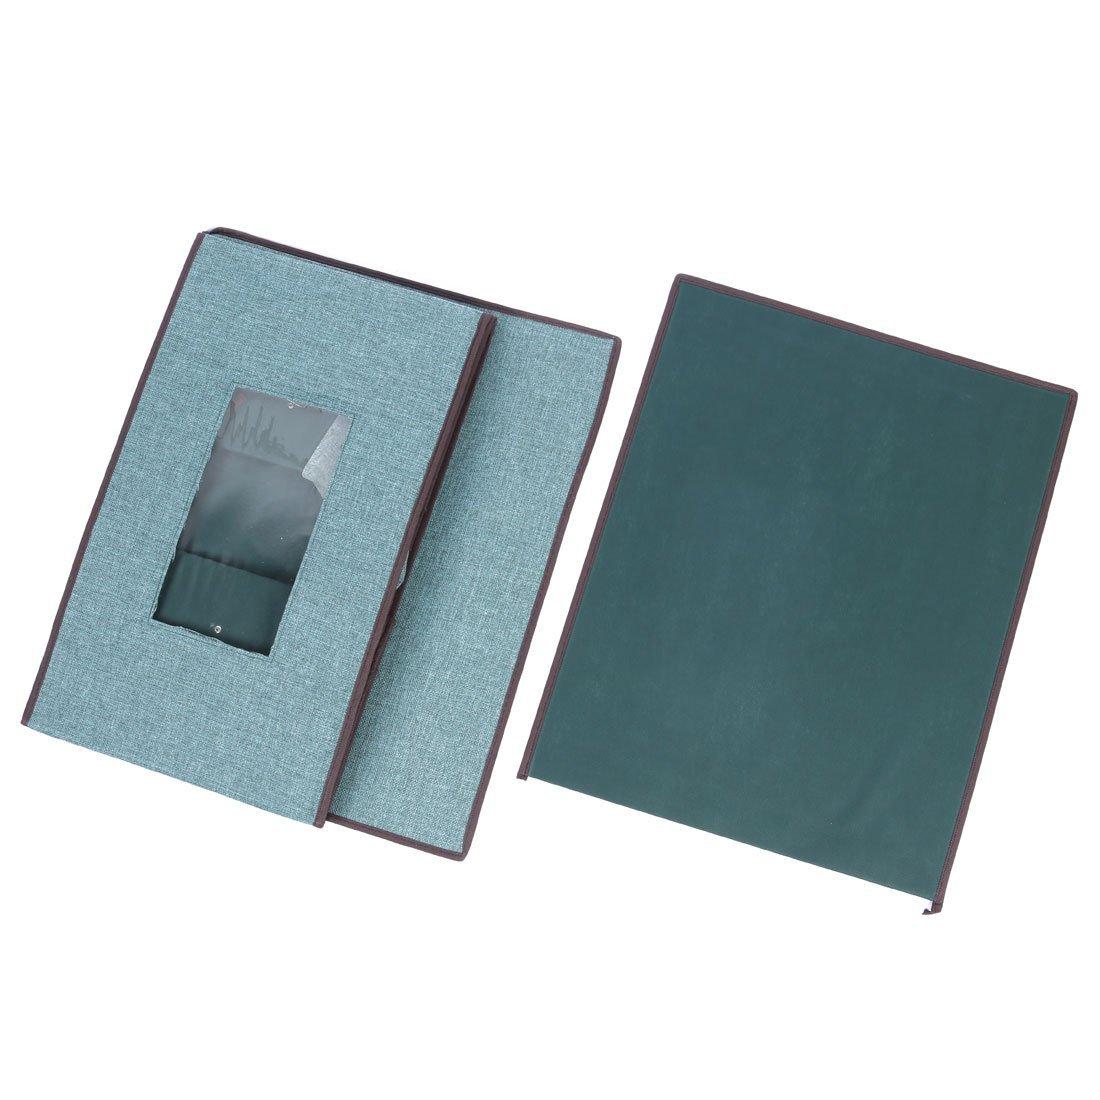 DealMux Linen Home Foldable Coat Quilt Book Holder Storage Box Case 50 x 40 x 30cm Dark Green